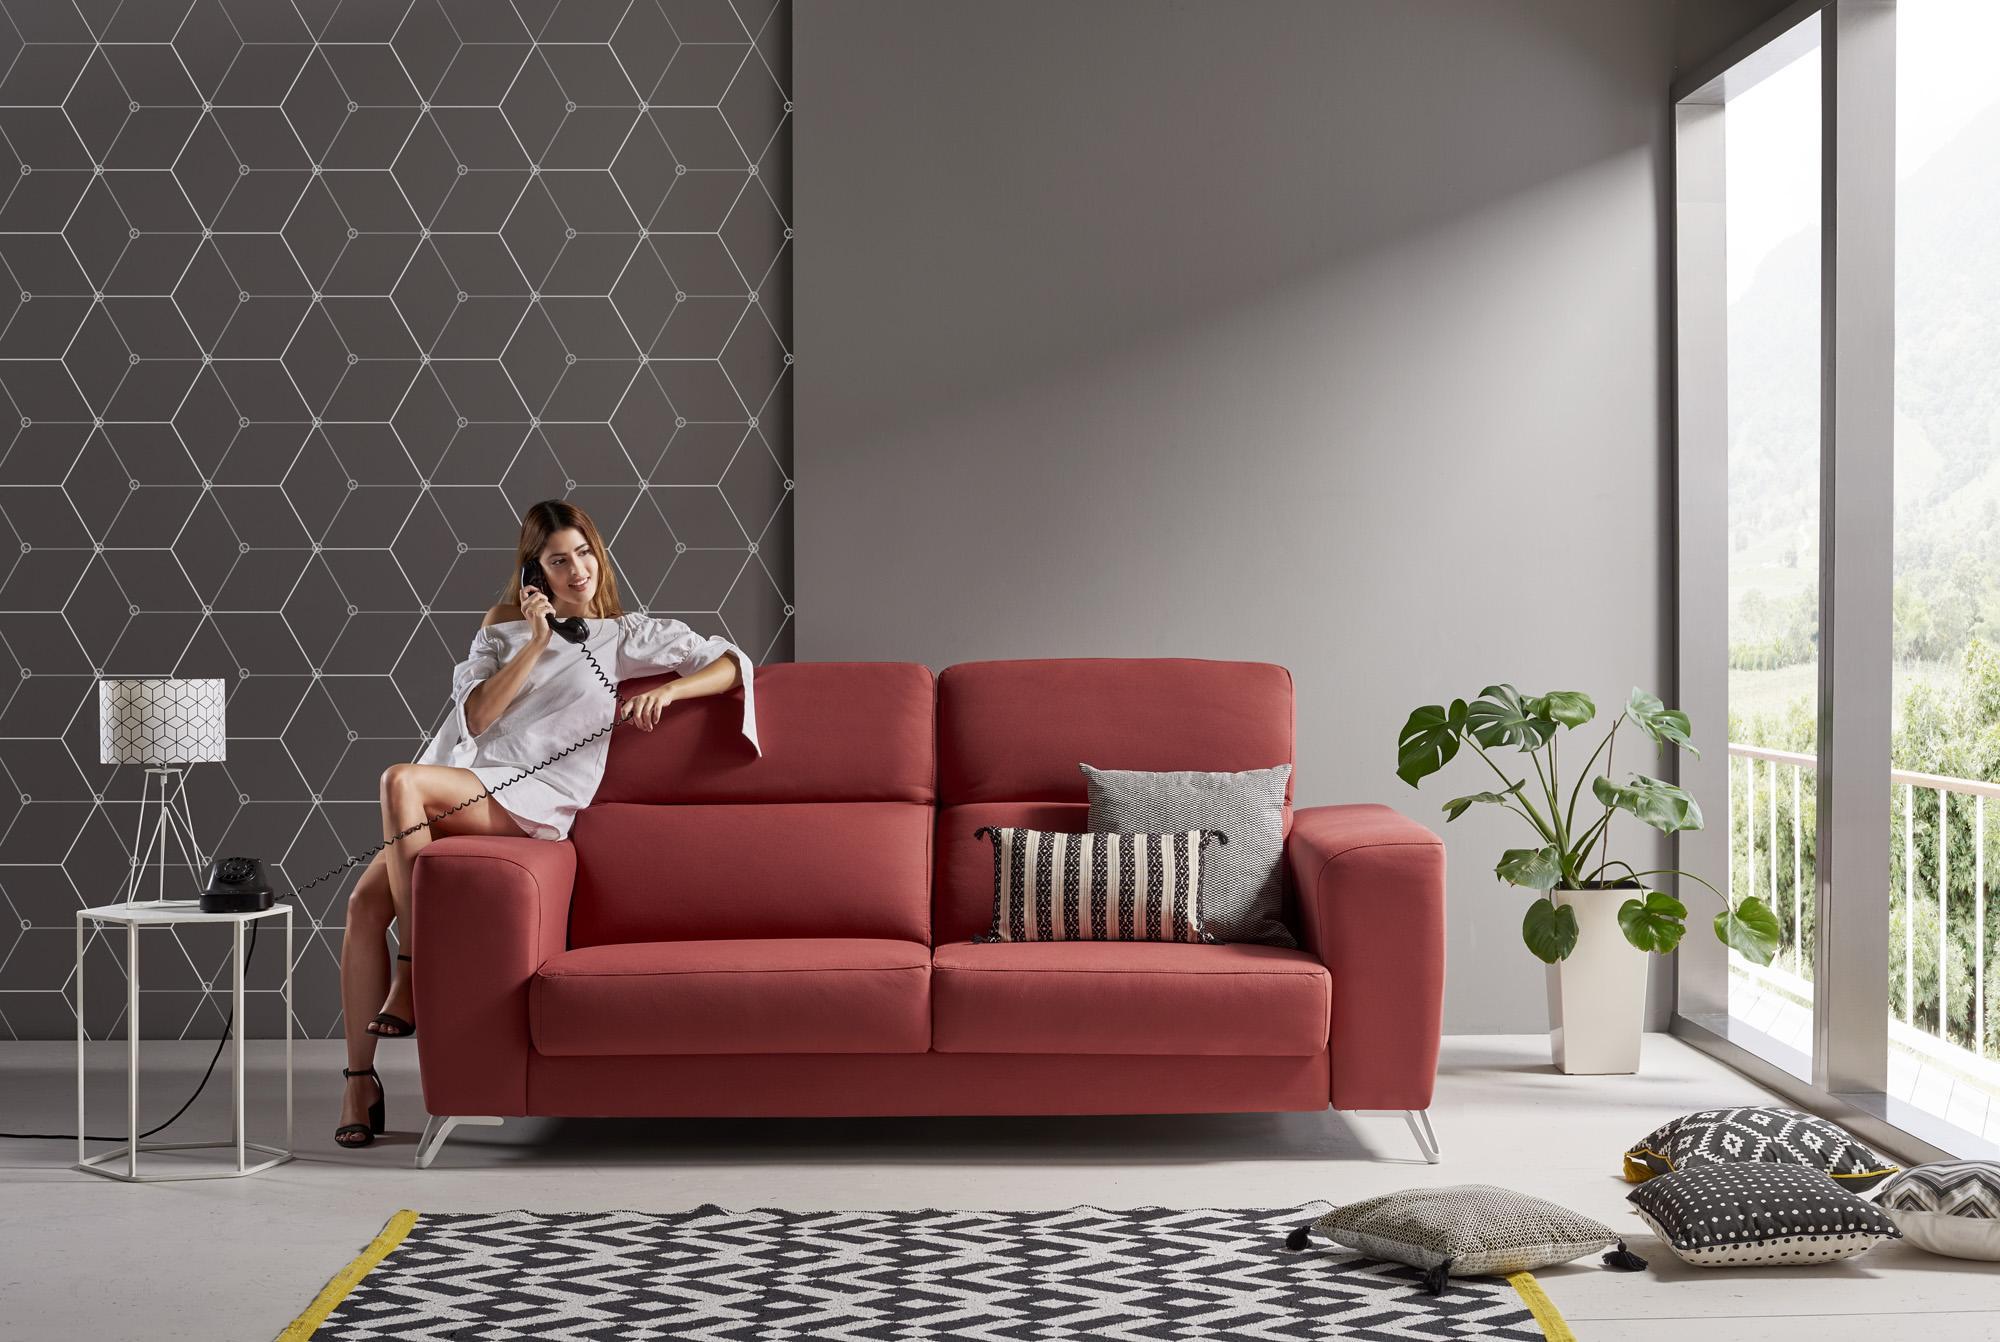 Sofá cama pequeño modelo Colonia de Noryk Home